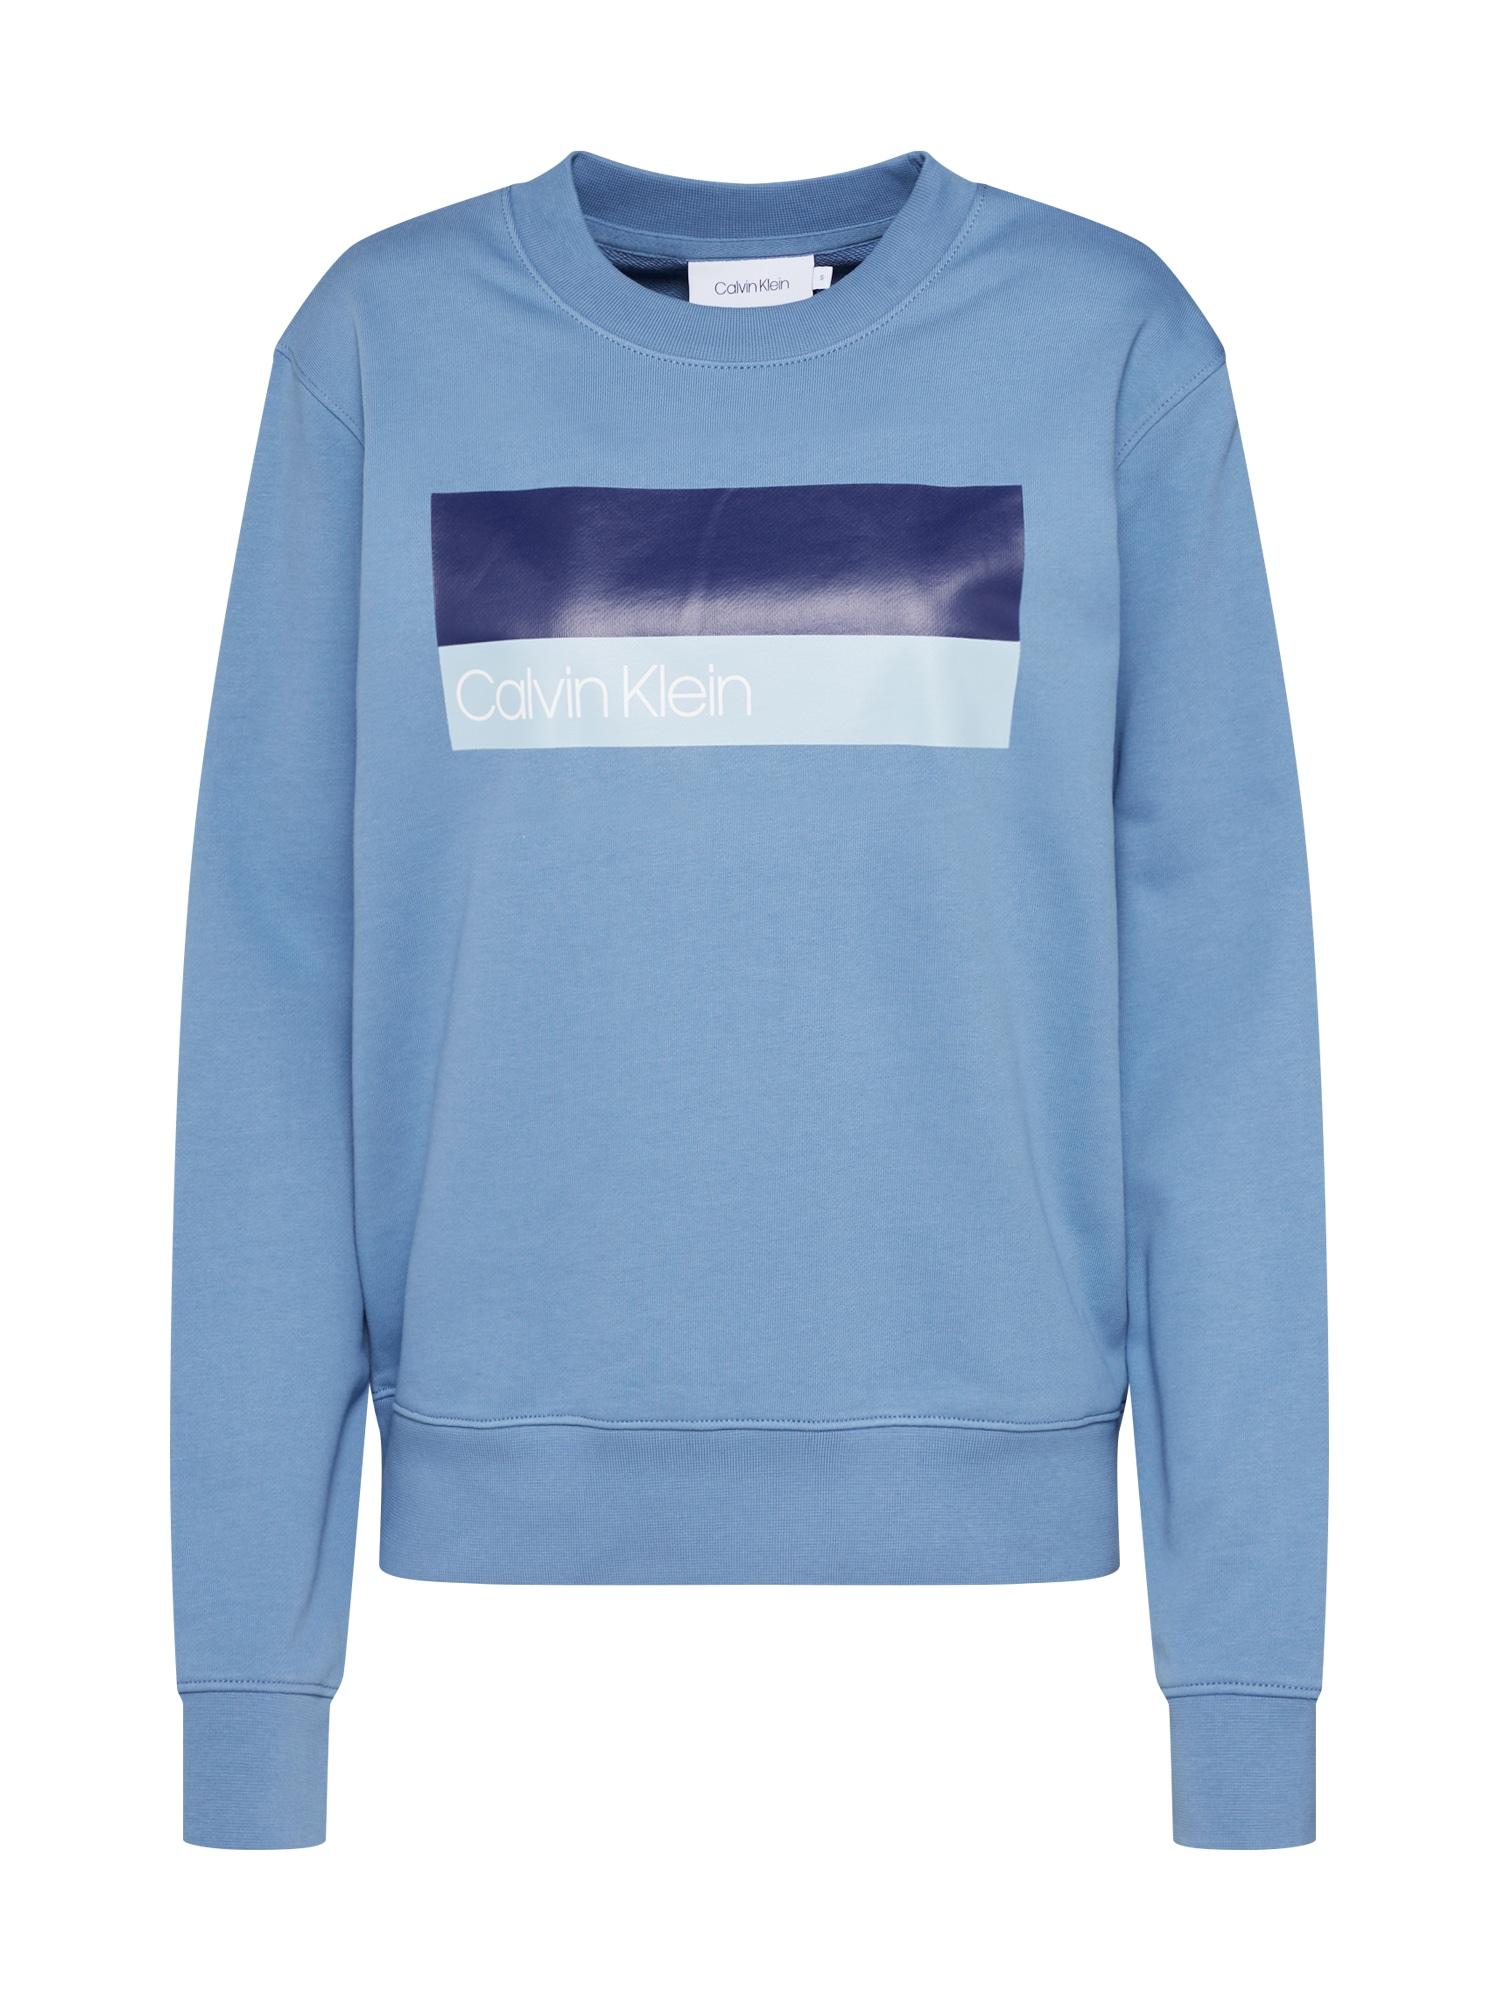 Sweatshirts  'DUO LOGO PRT SWEATSHIRT LS' | Bekleidung > Sweatshirts & -jacken > Sweatshirts | Blau | Calvin Klein